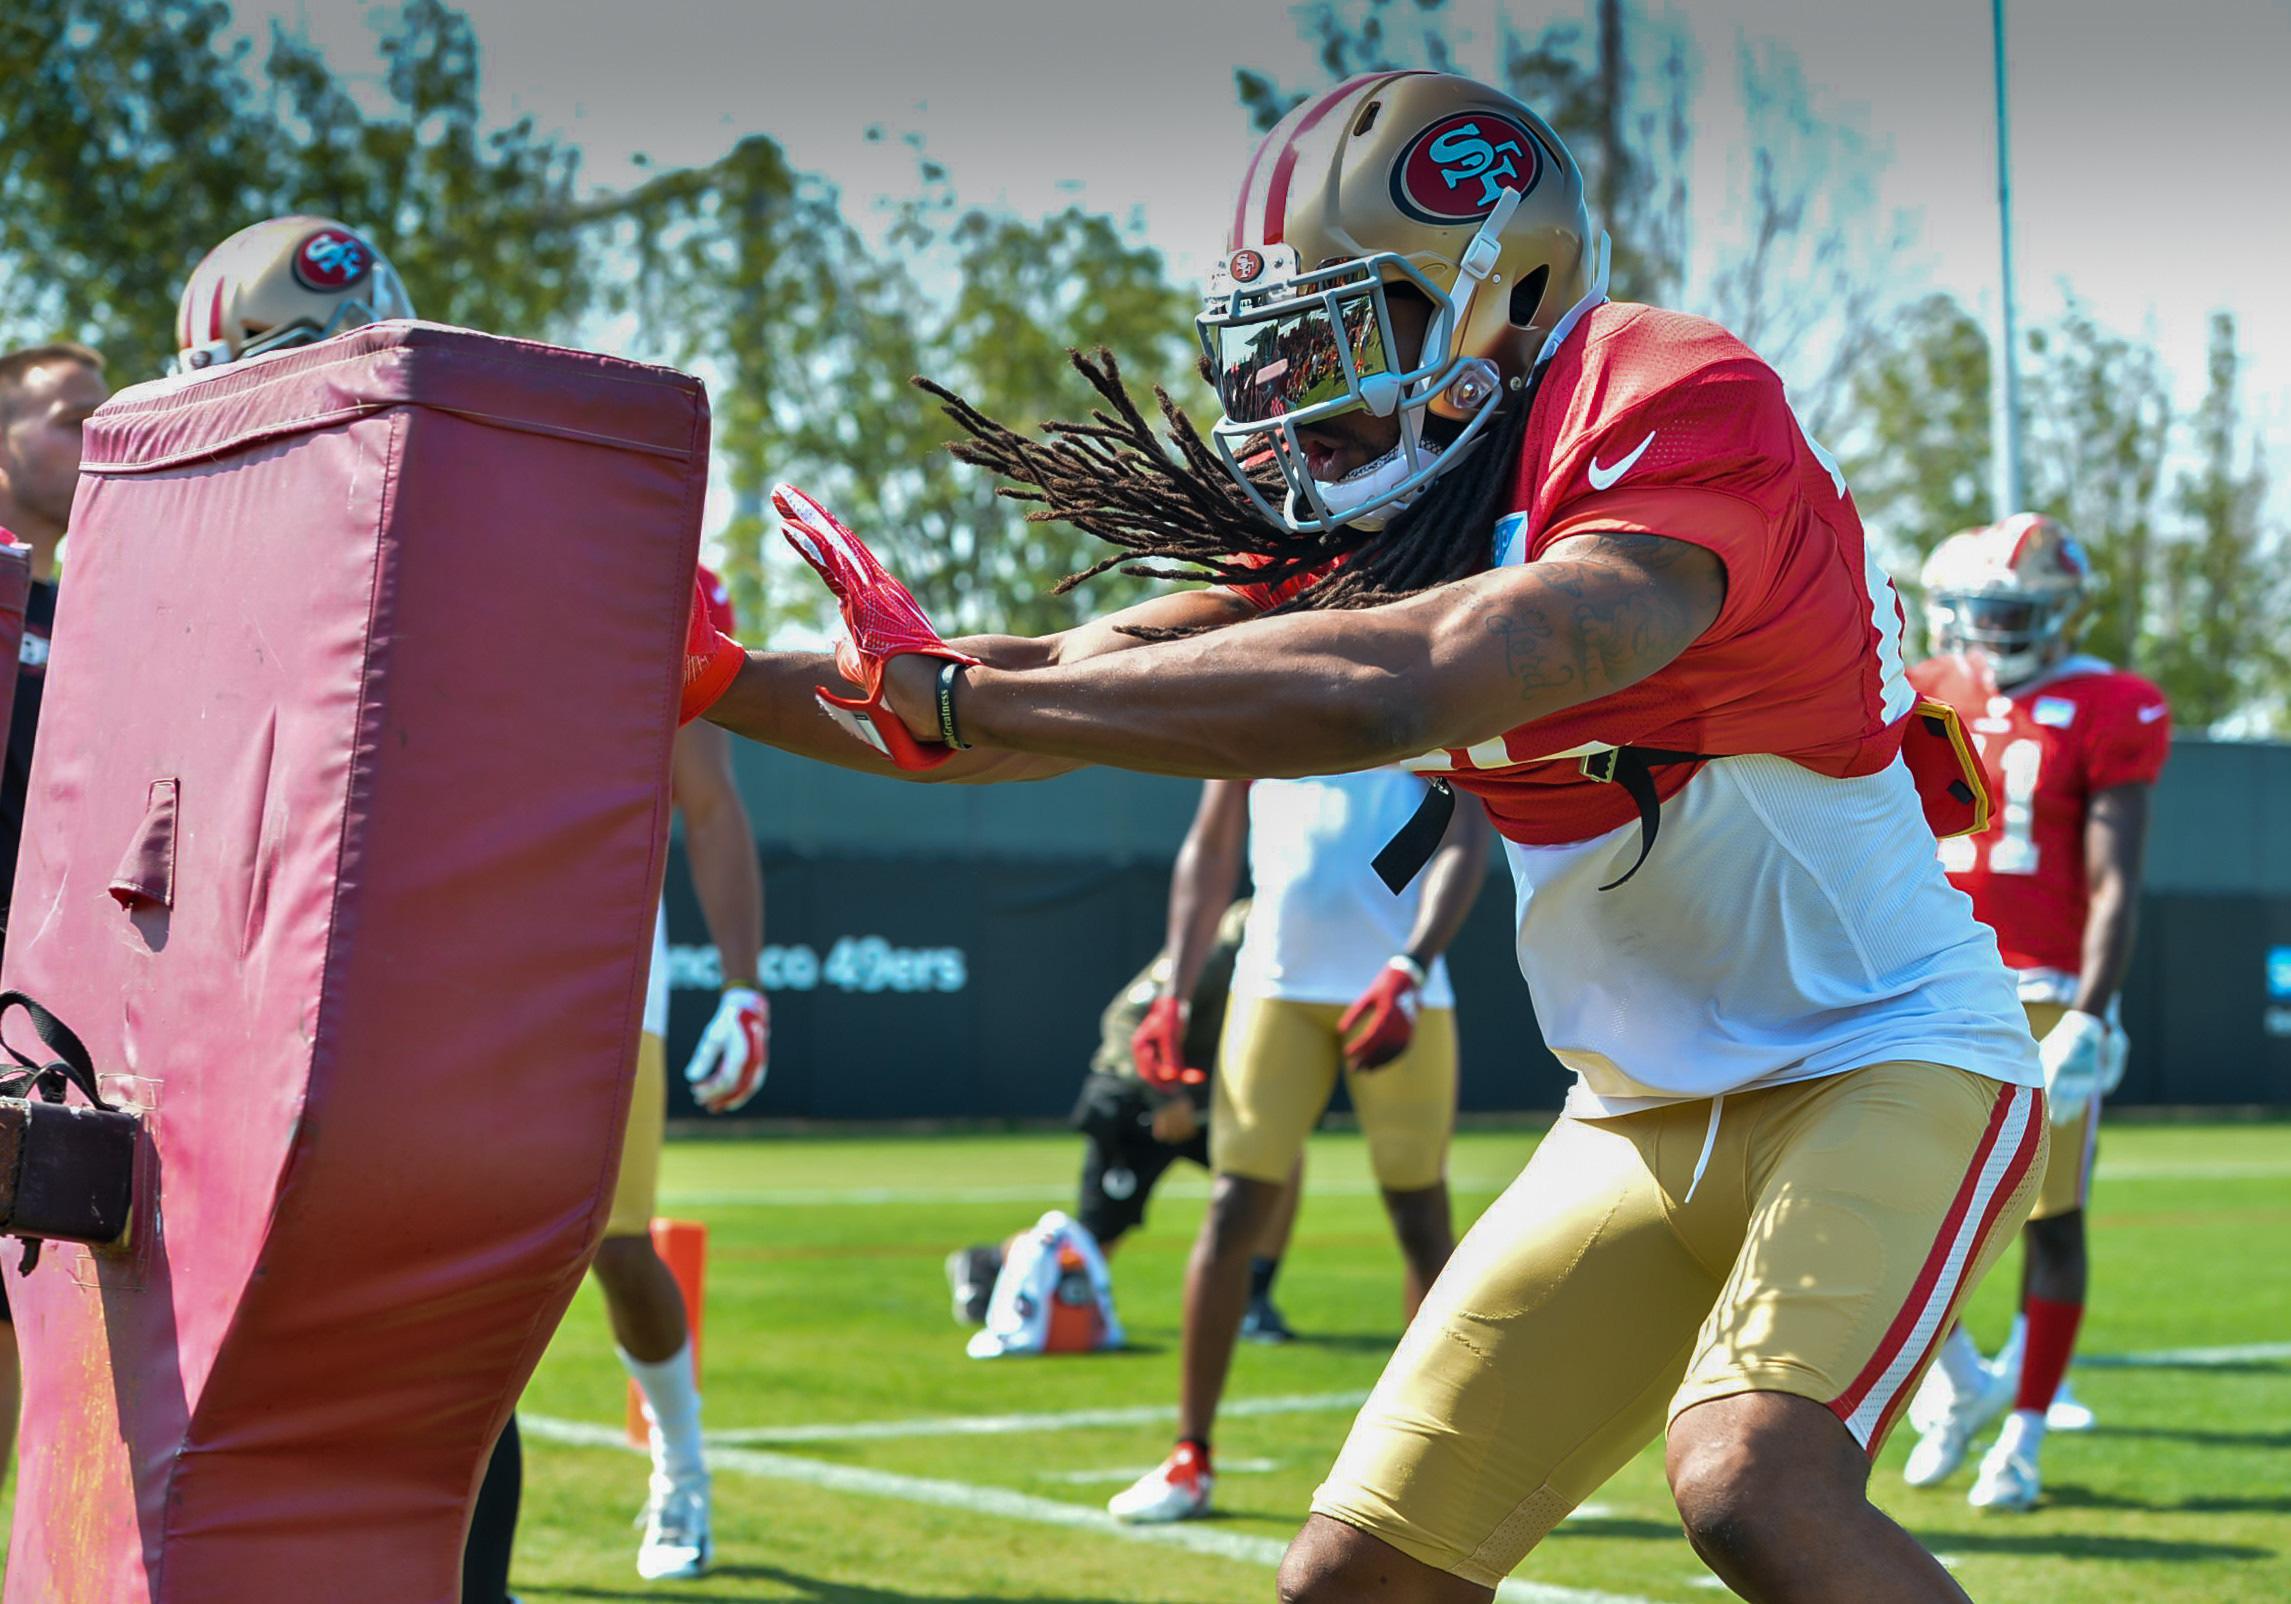 NFL: AUG 12 49ers Training Camp